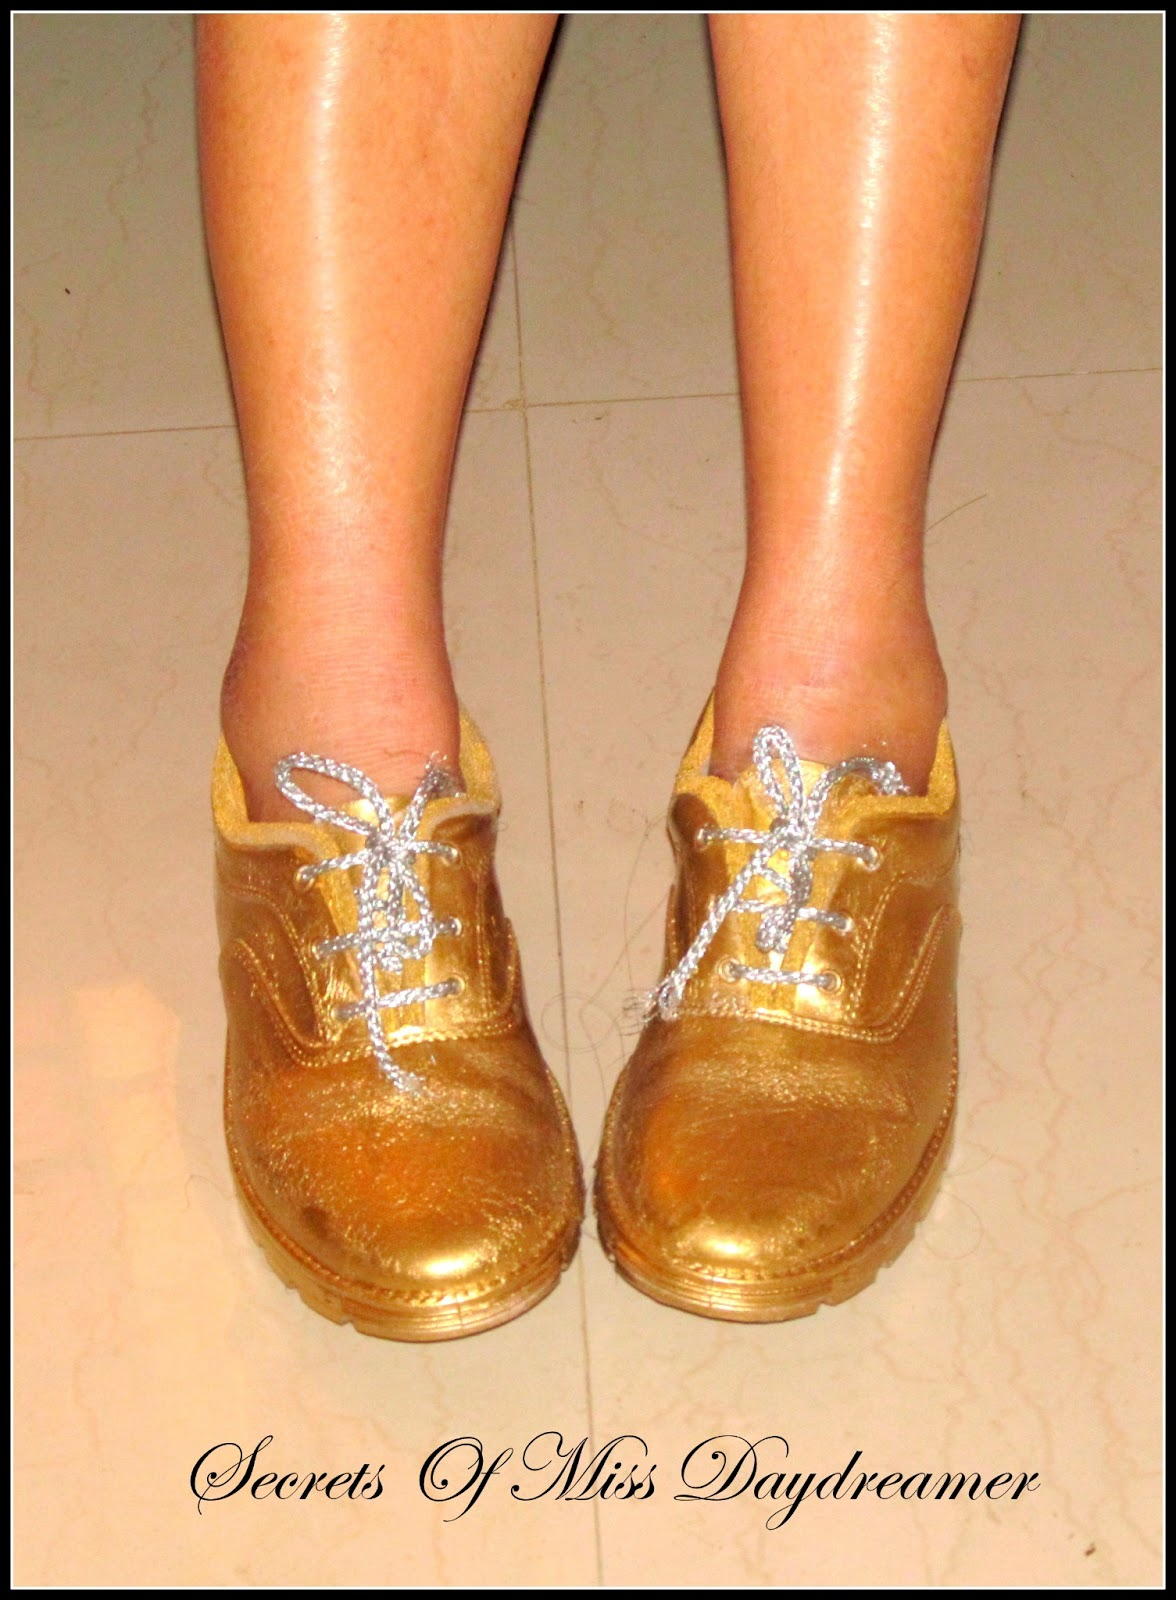 secrets of miss day dreamer diy paint your shoes gold. Black Bedroom Furniture Sets. Home Design Ideas